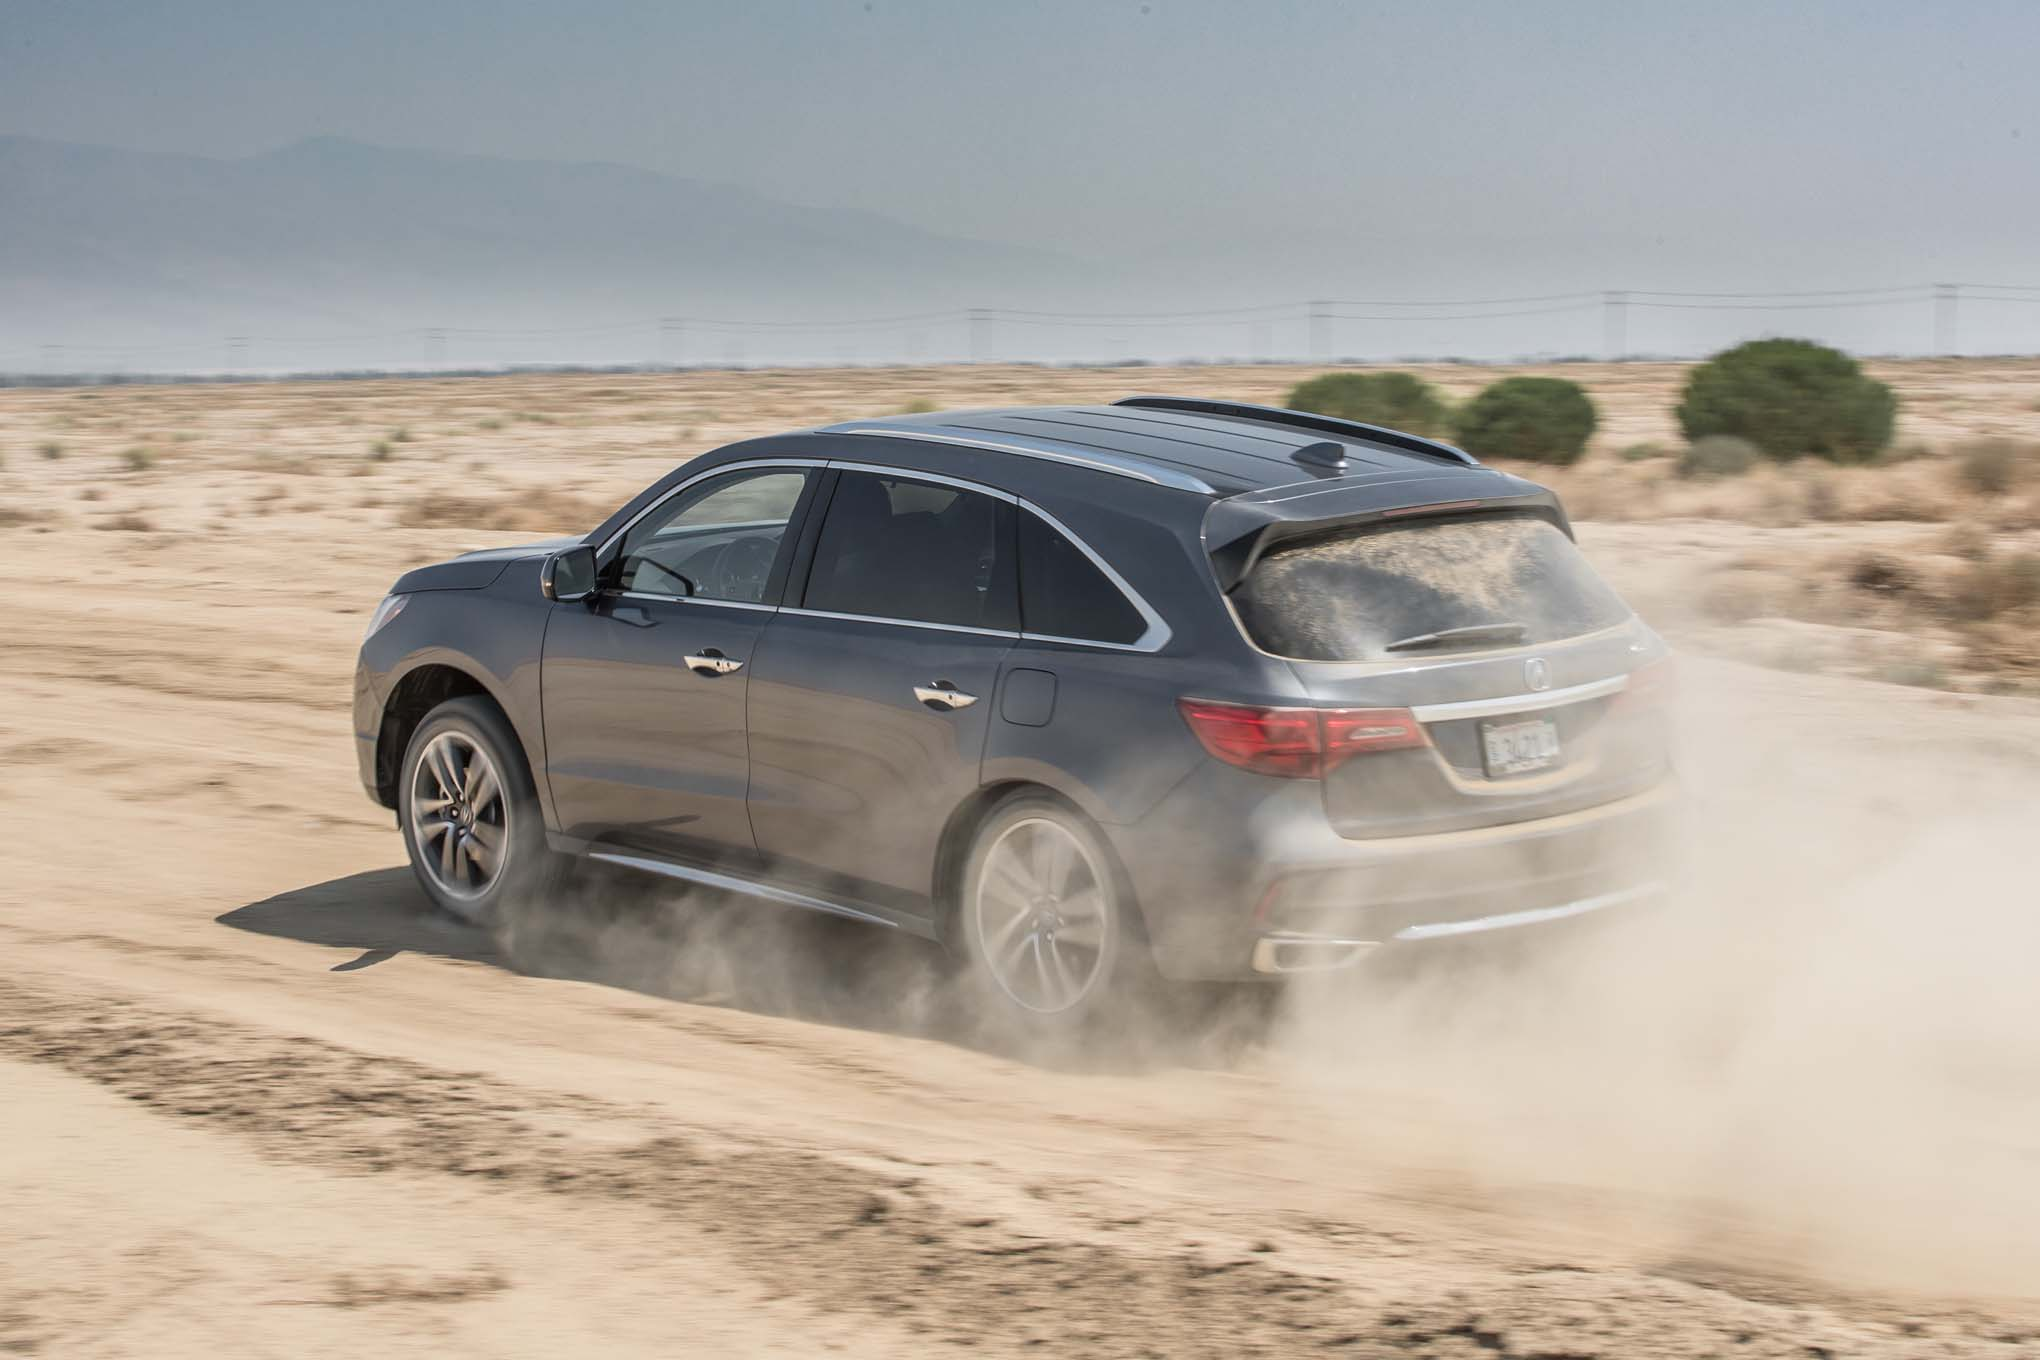 2017 Acura MDX SH AWD rear three quarter in motion